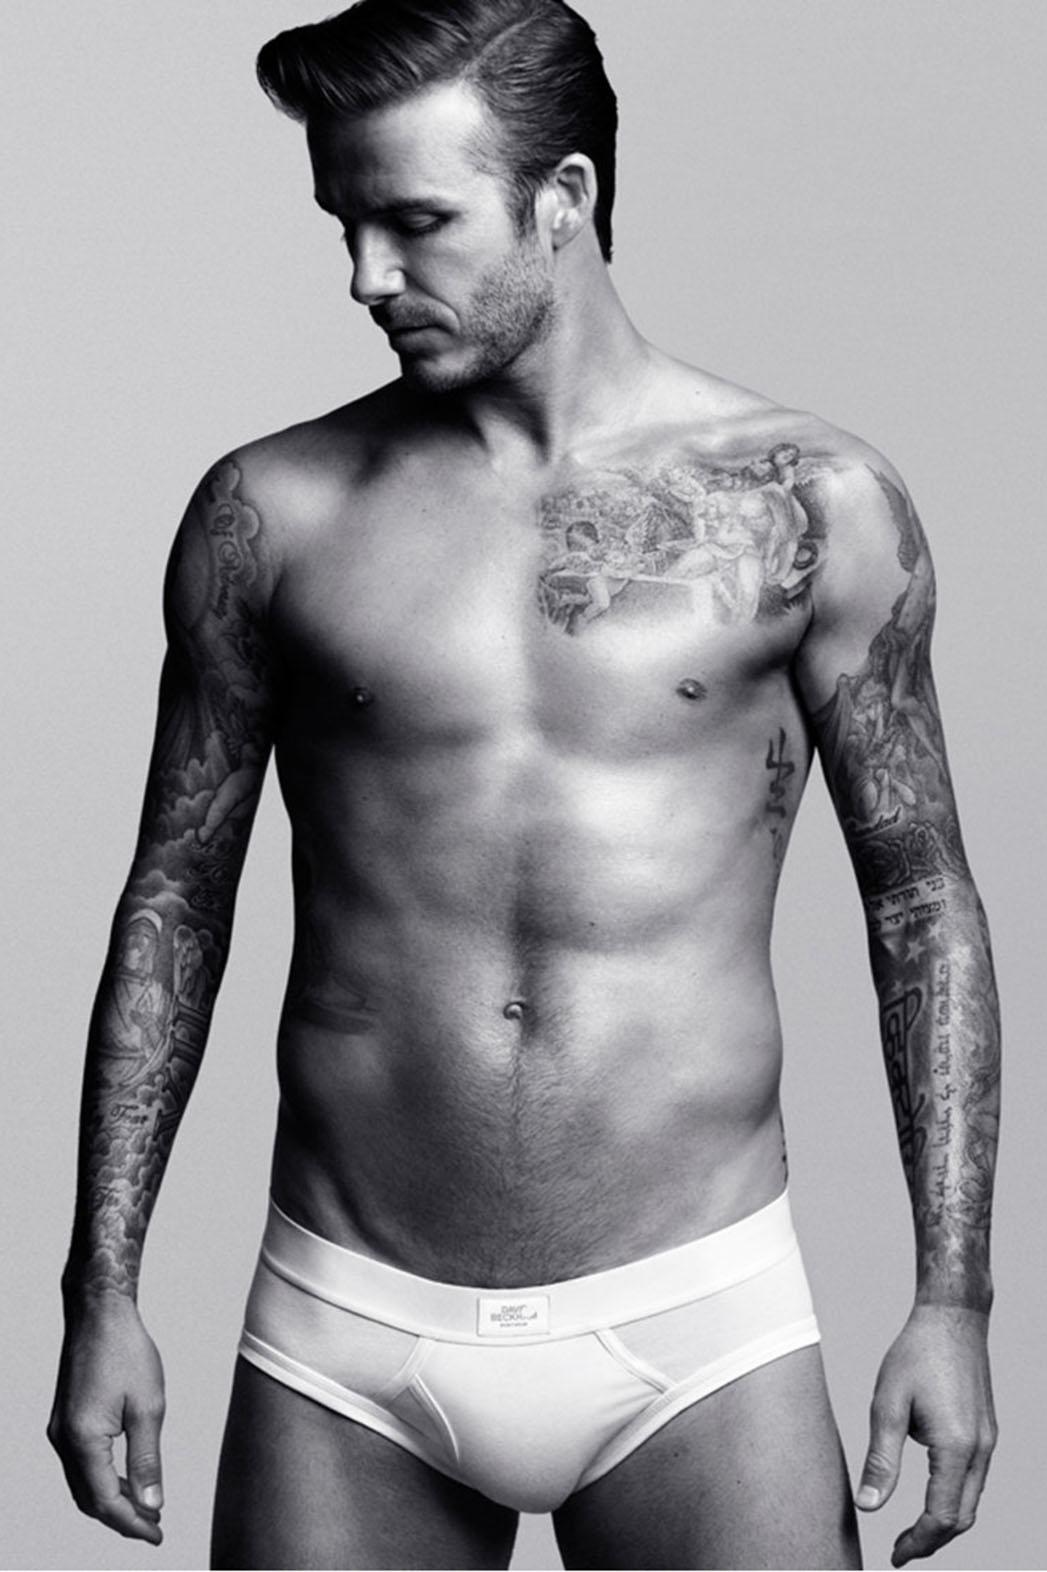 David Beckam ovvero il trend dov'erano i peli oggi c'è un tatoo (photo Hollywoodreporter.com)